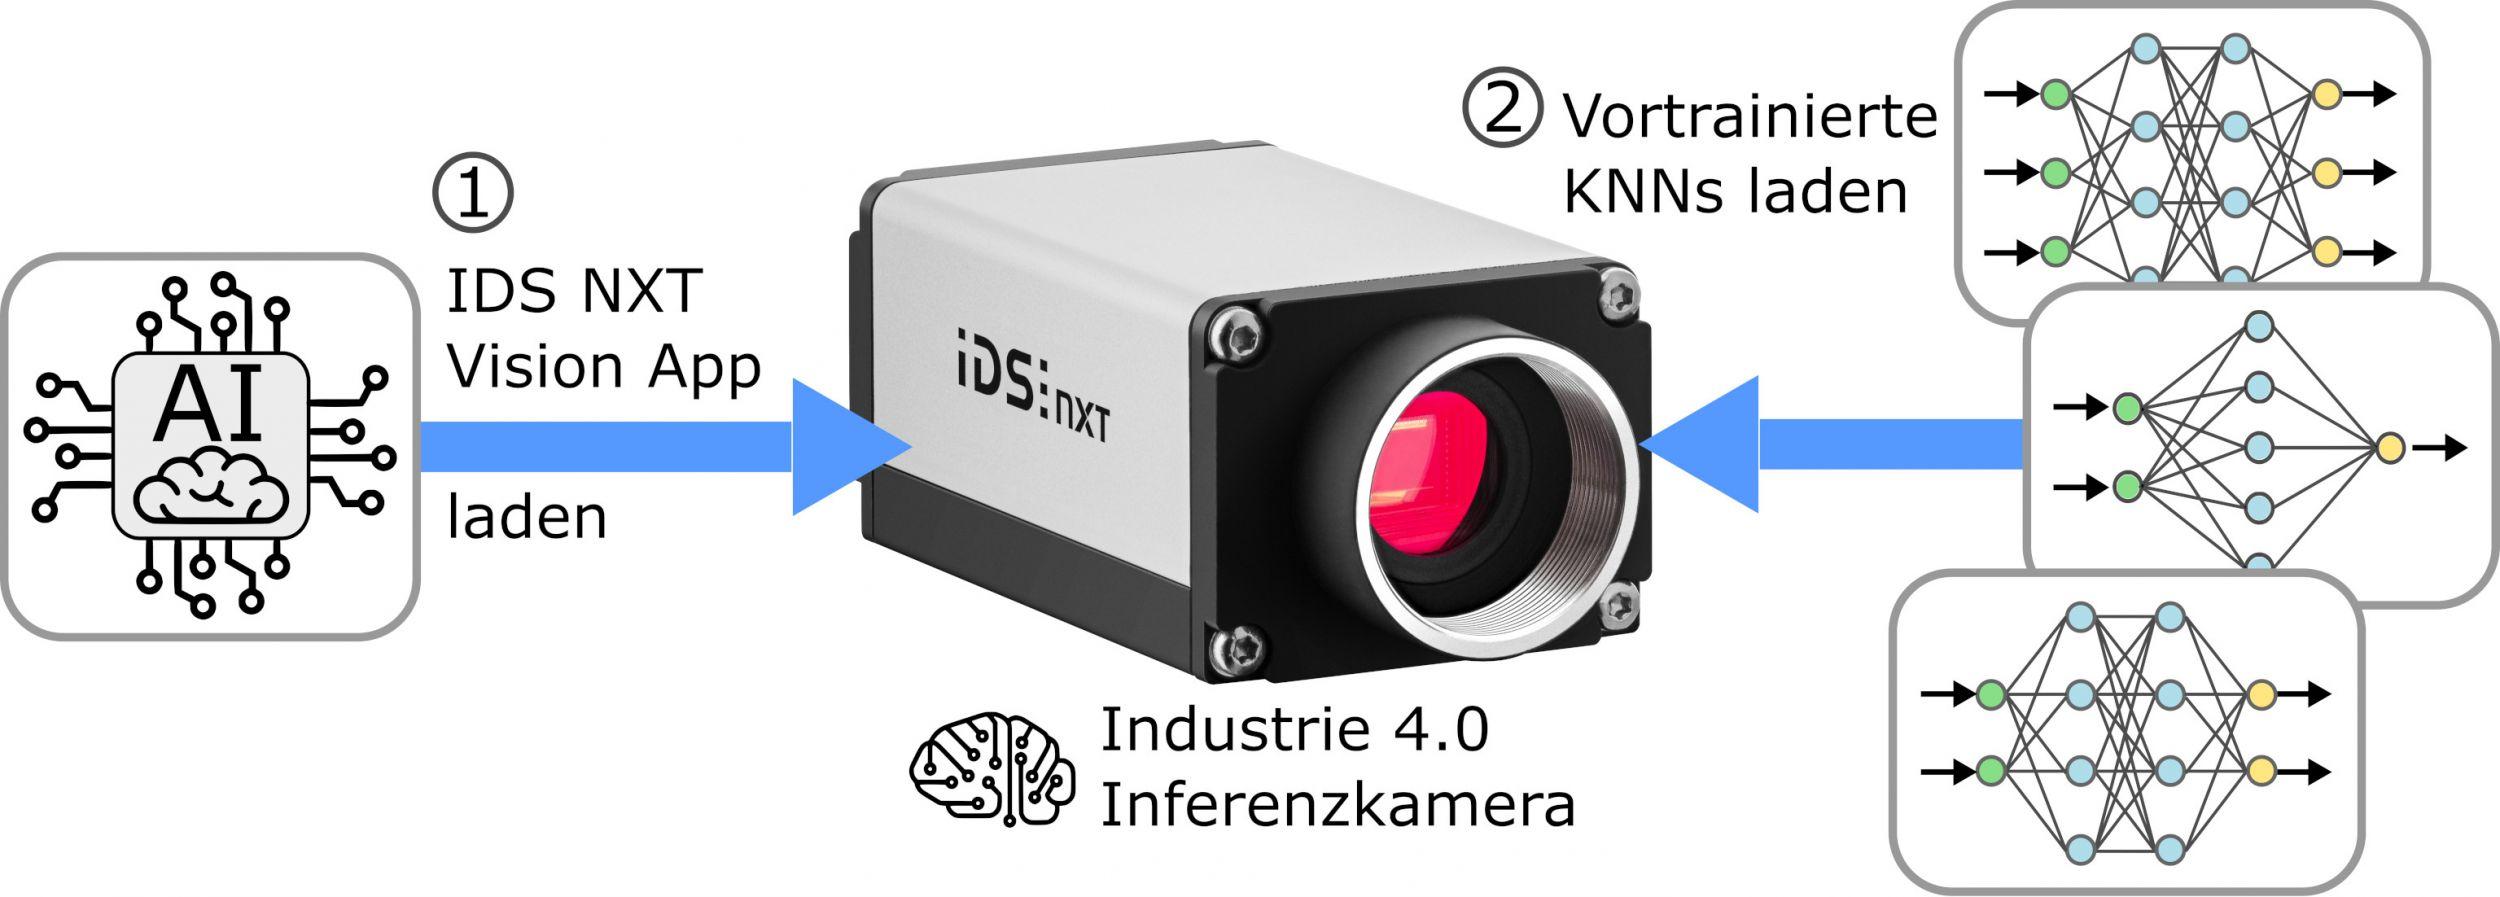 KI als App für Vision-Kameras